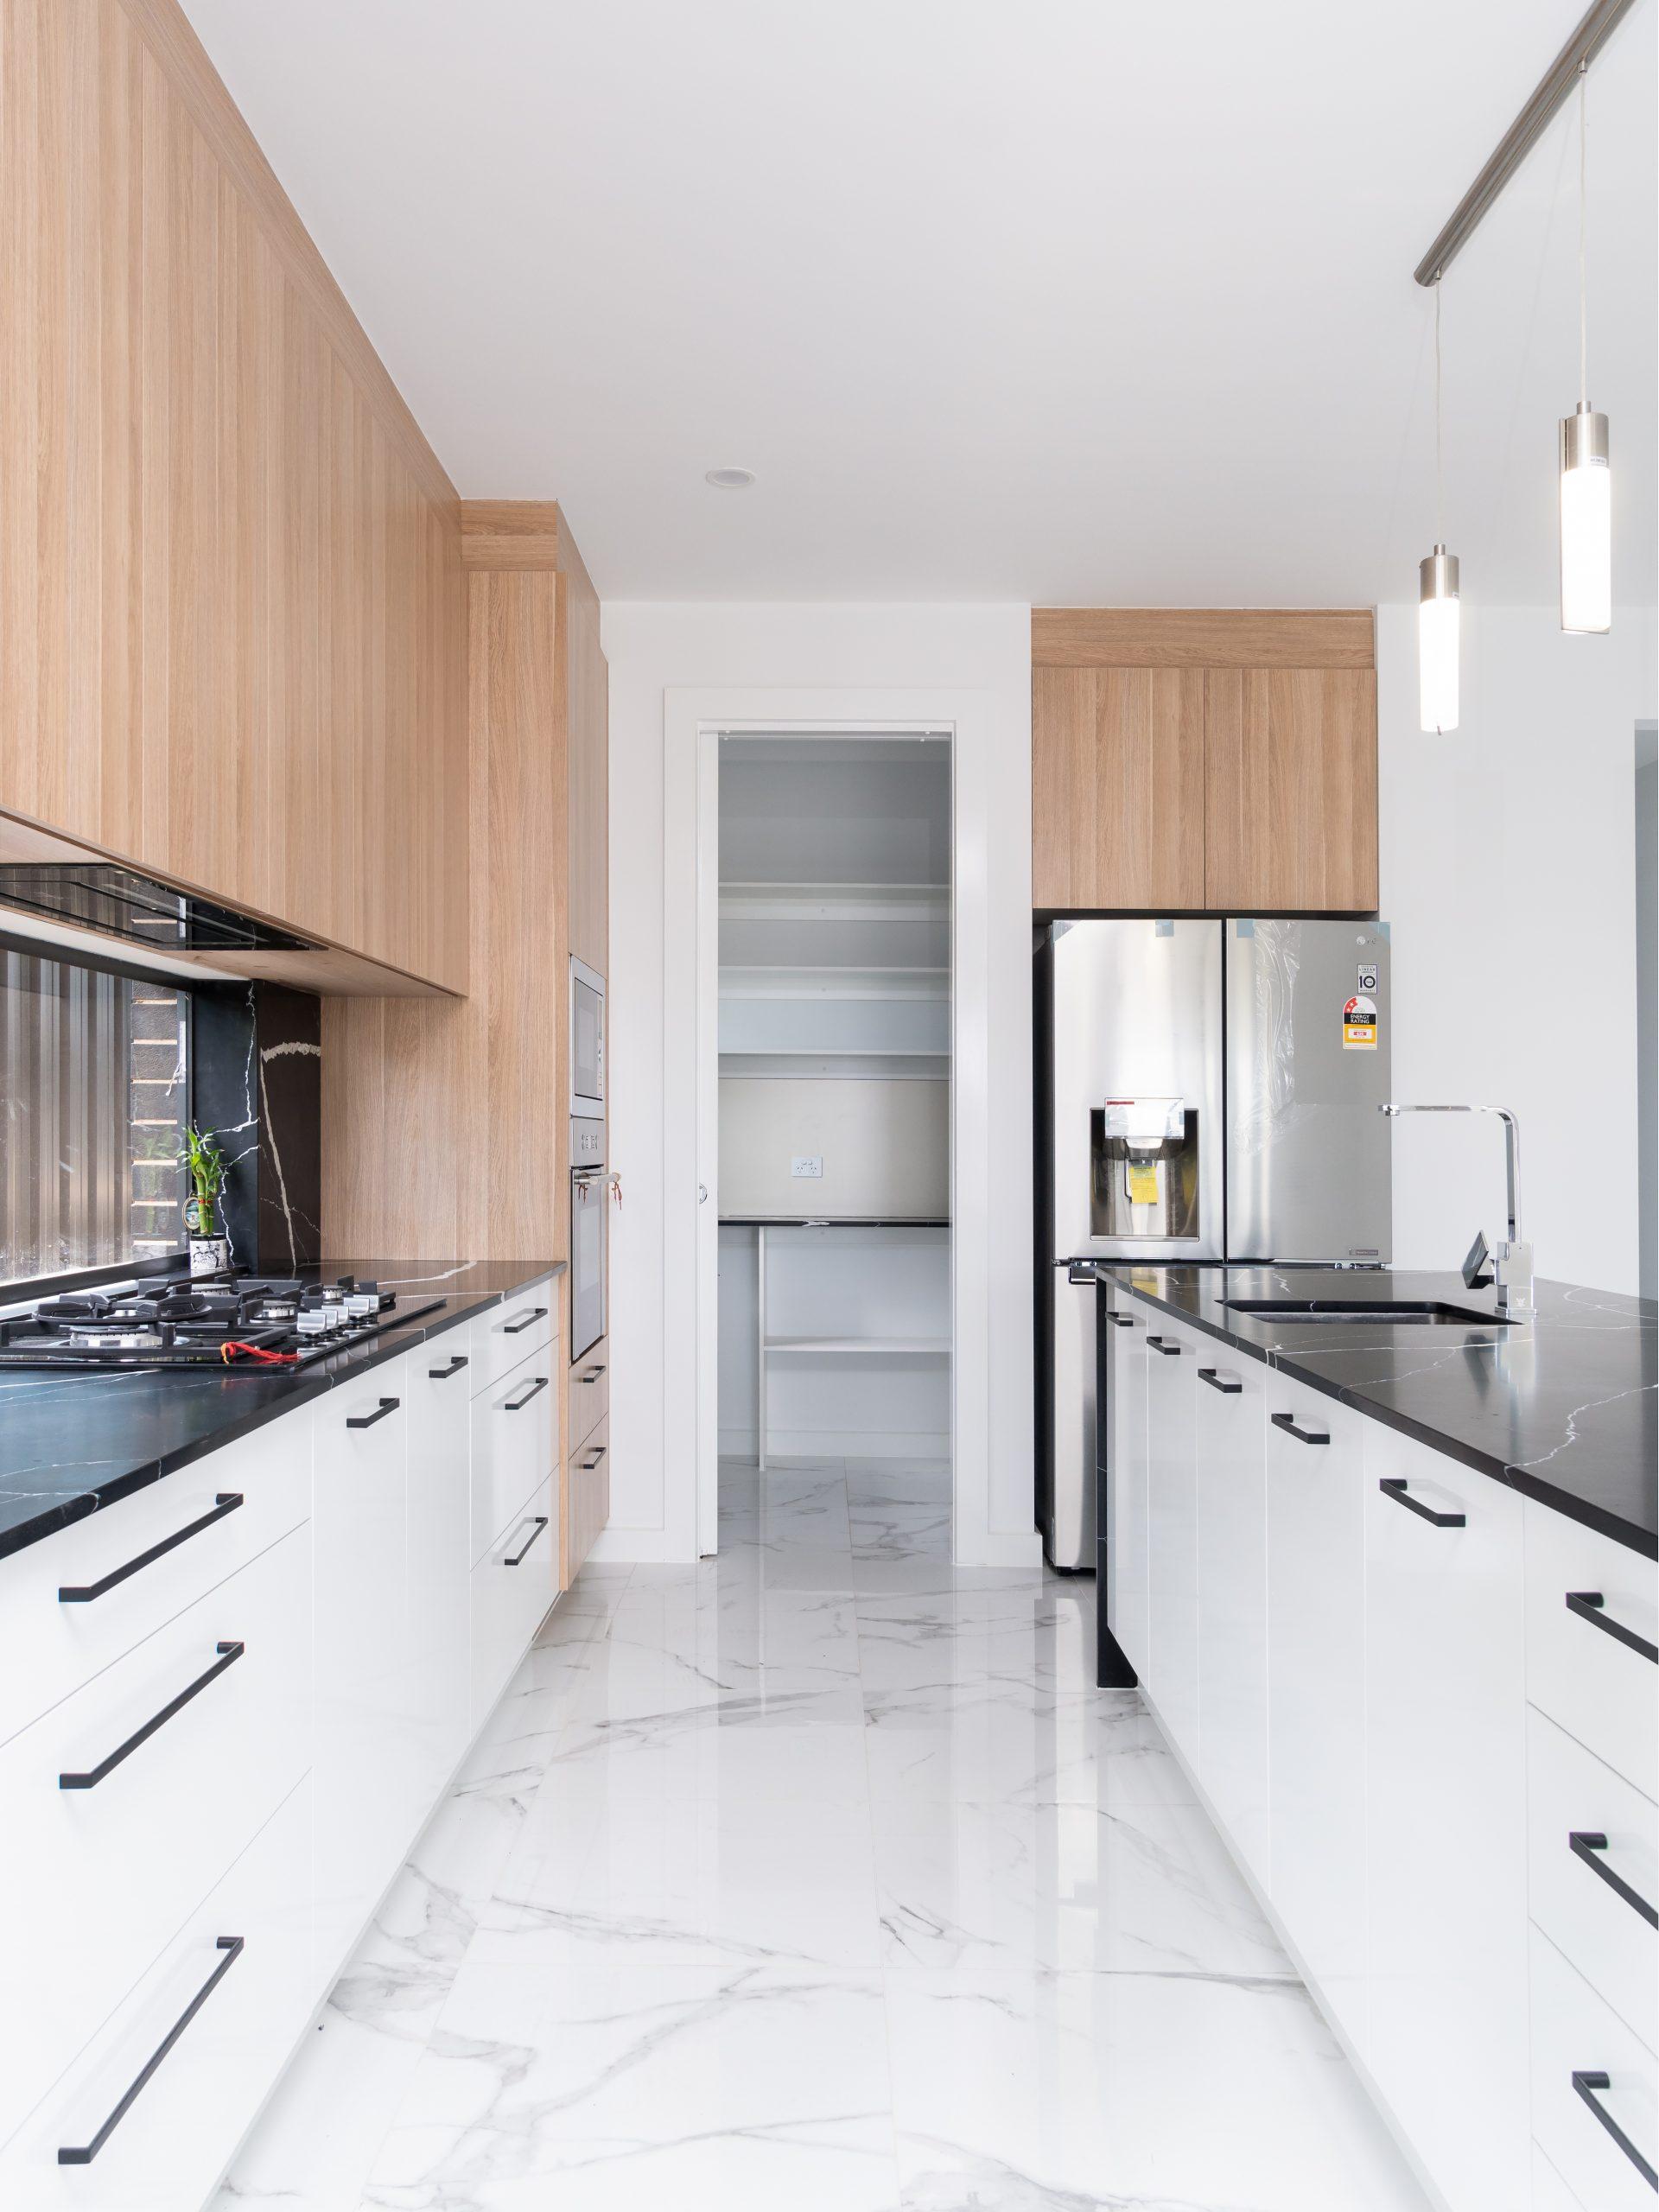 Kidman Park - Kelsey - HBC Homes Adelaide - _PRO2257-Edit